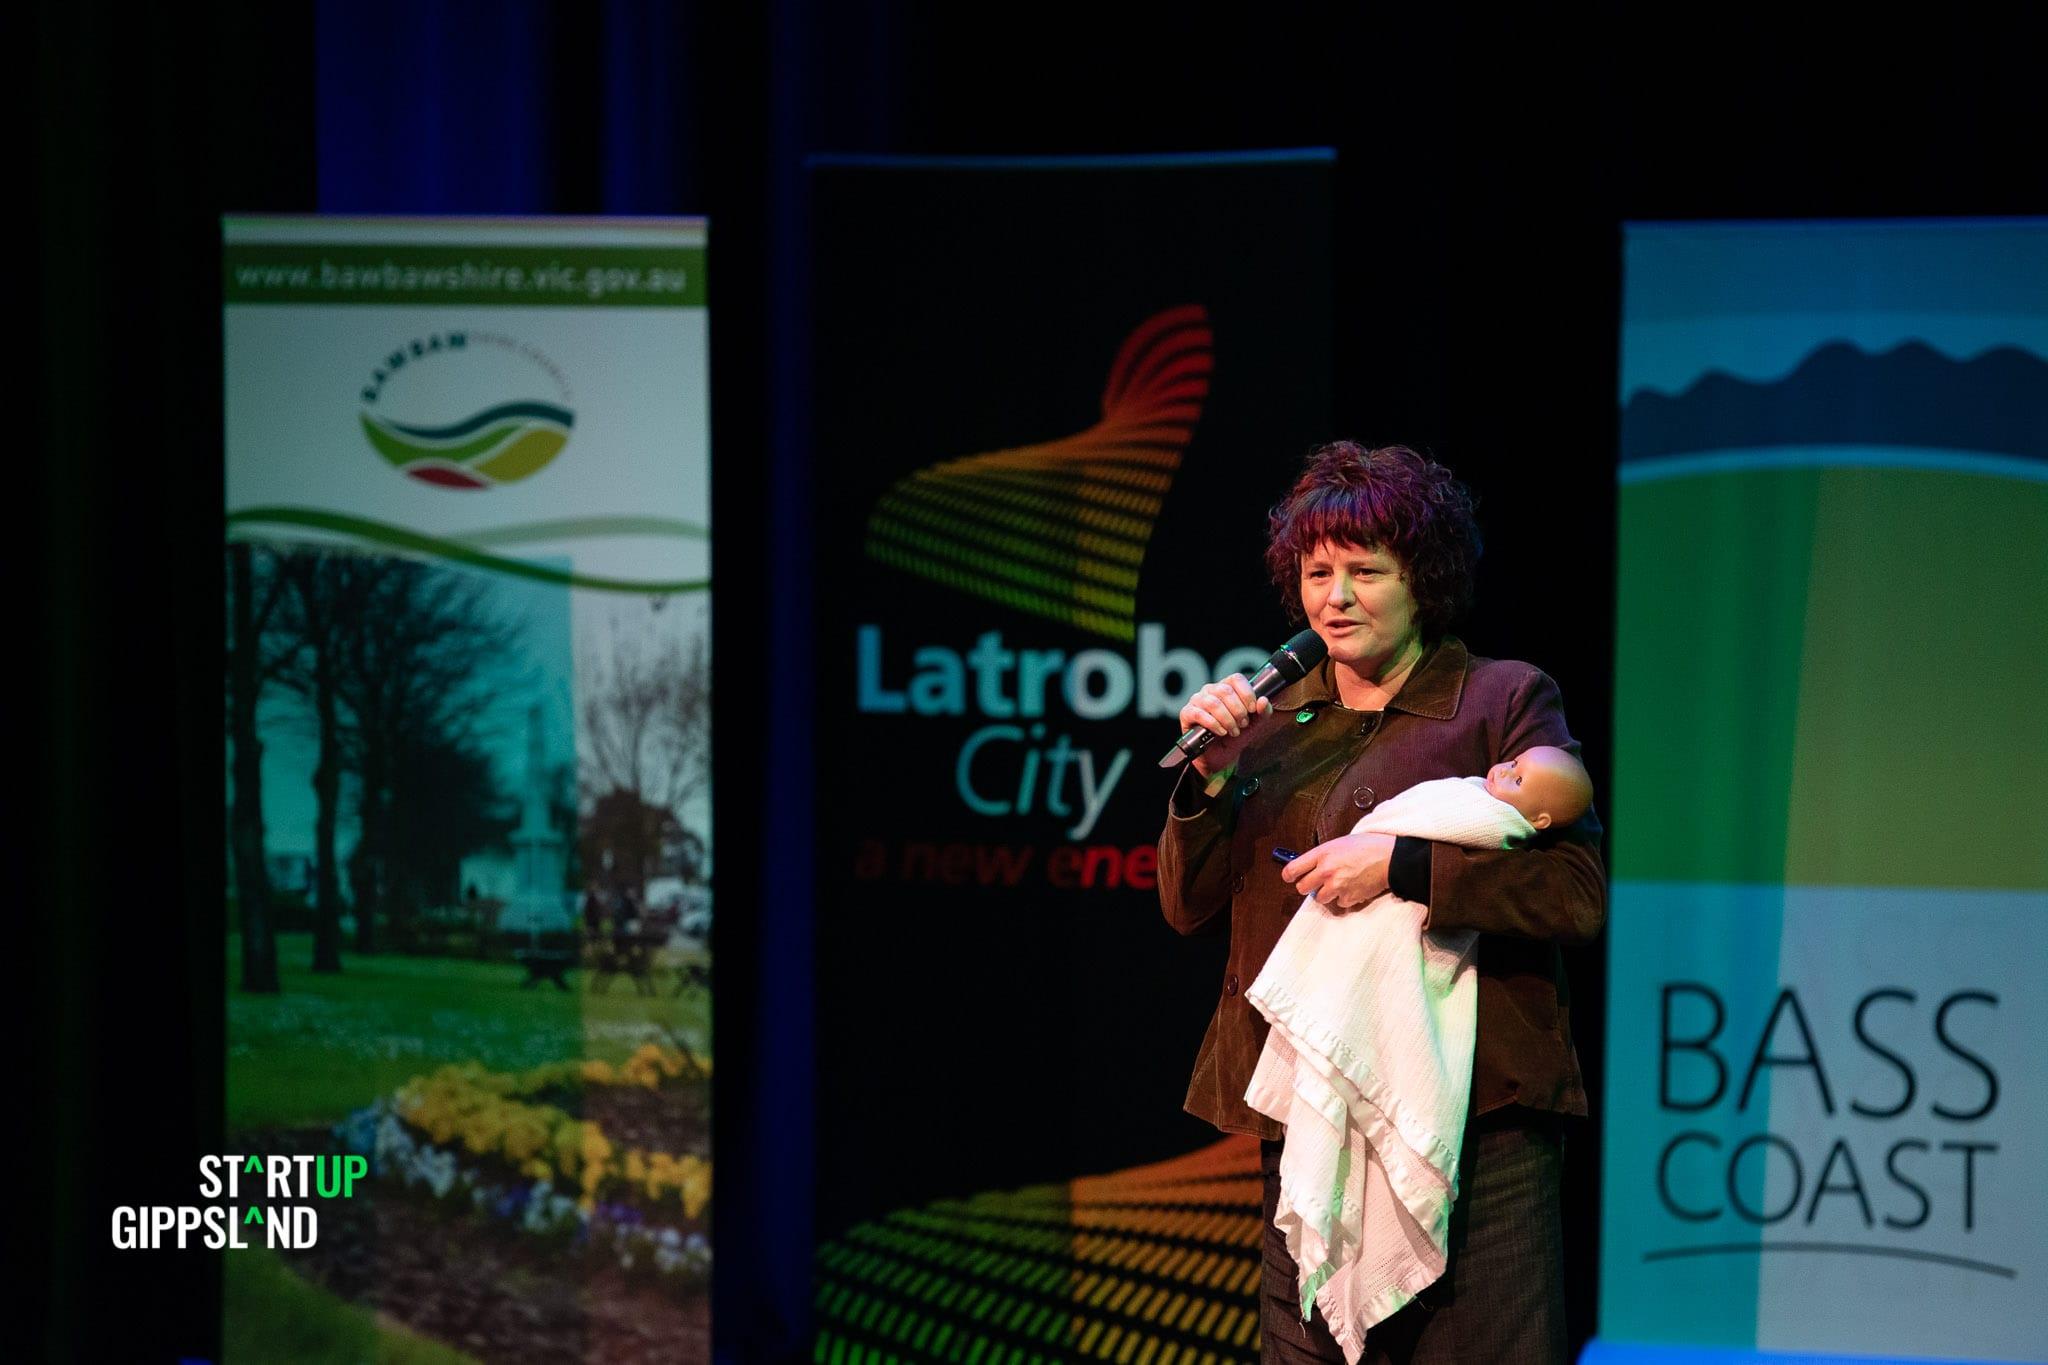 Kristen Robbins The Worksheds Alternative Startup Gippsland Showcase Jakub Fabijanski public speaking